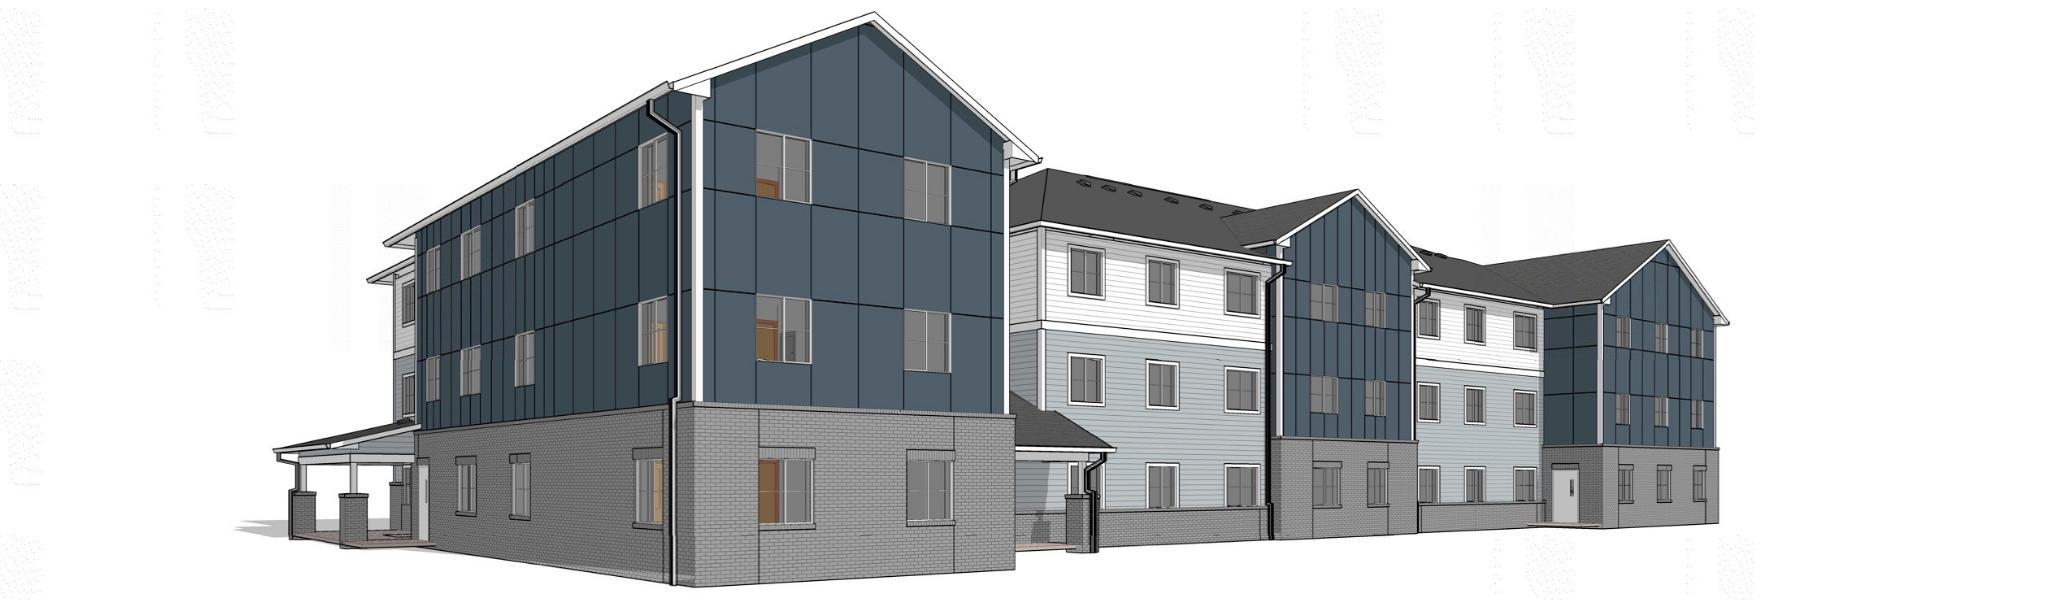 jefferson village affordable housing